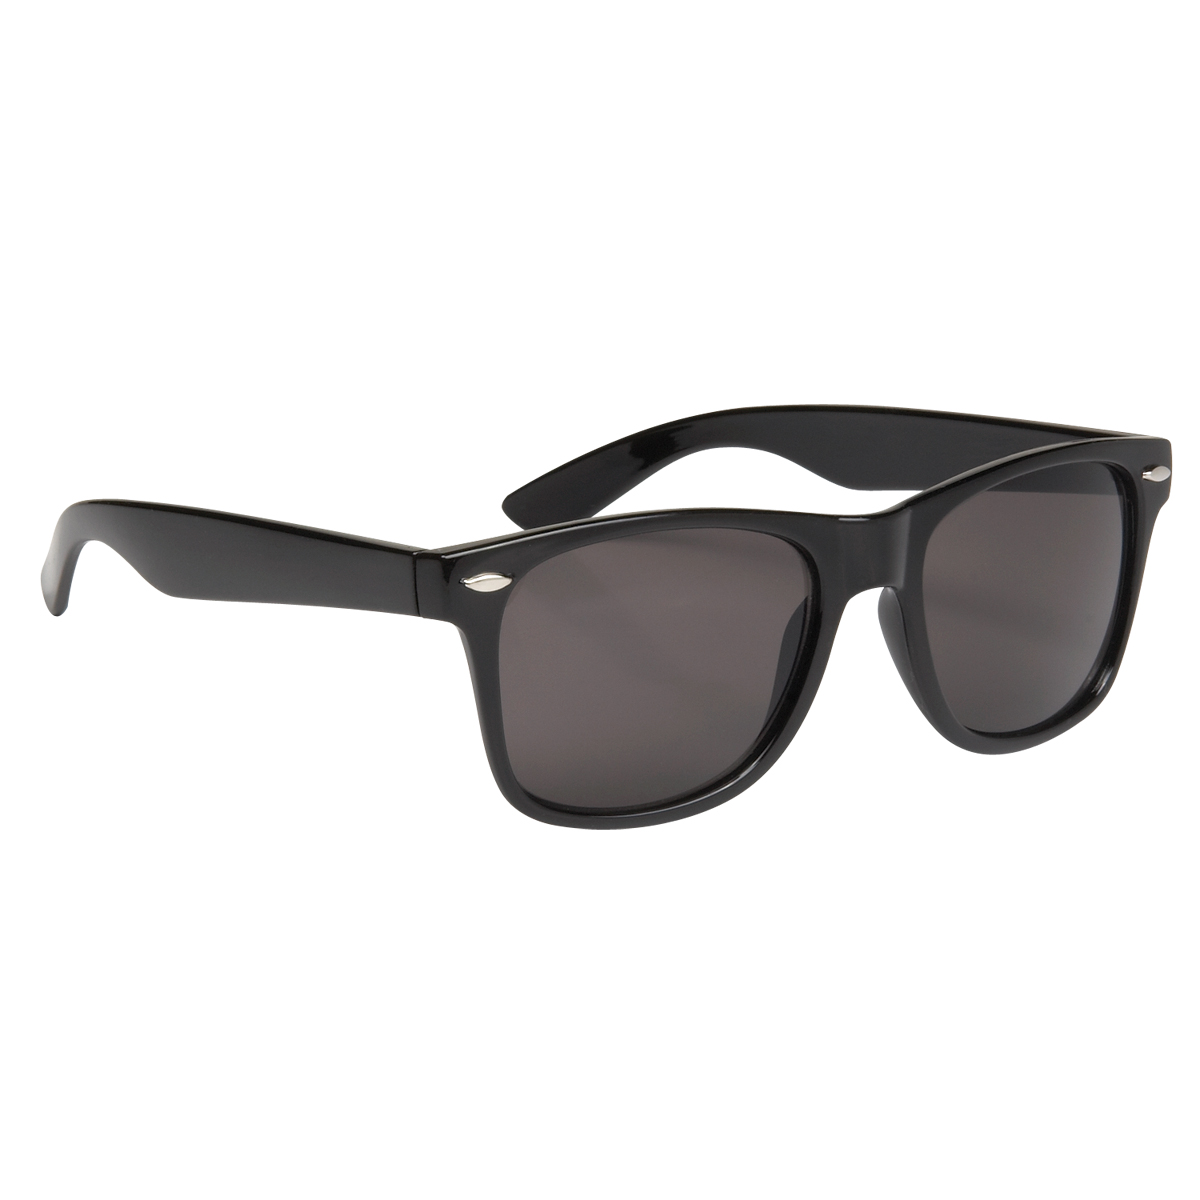 Sunglasses - Imitation